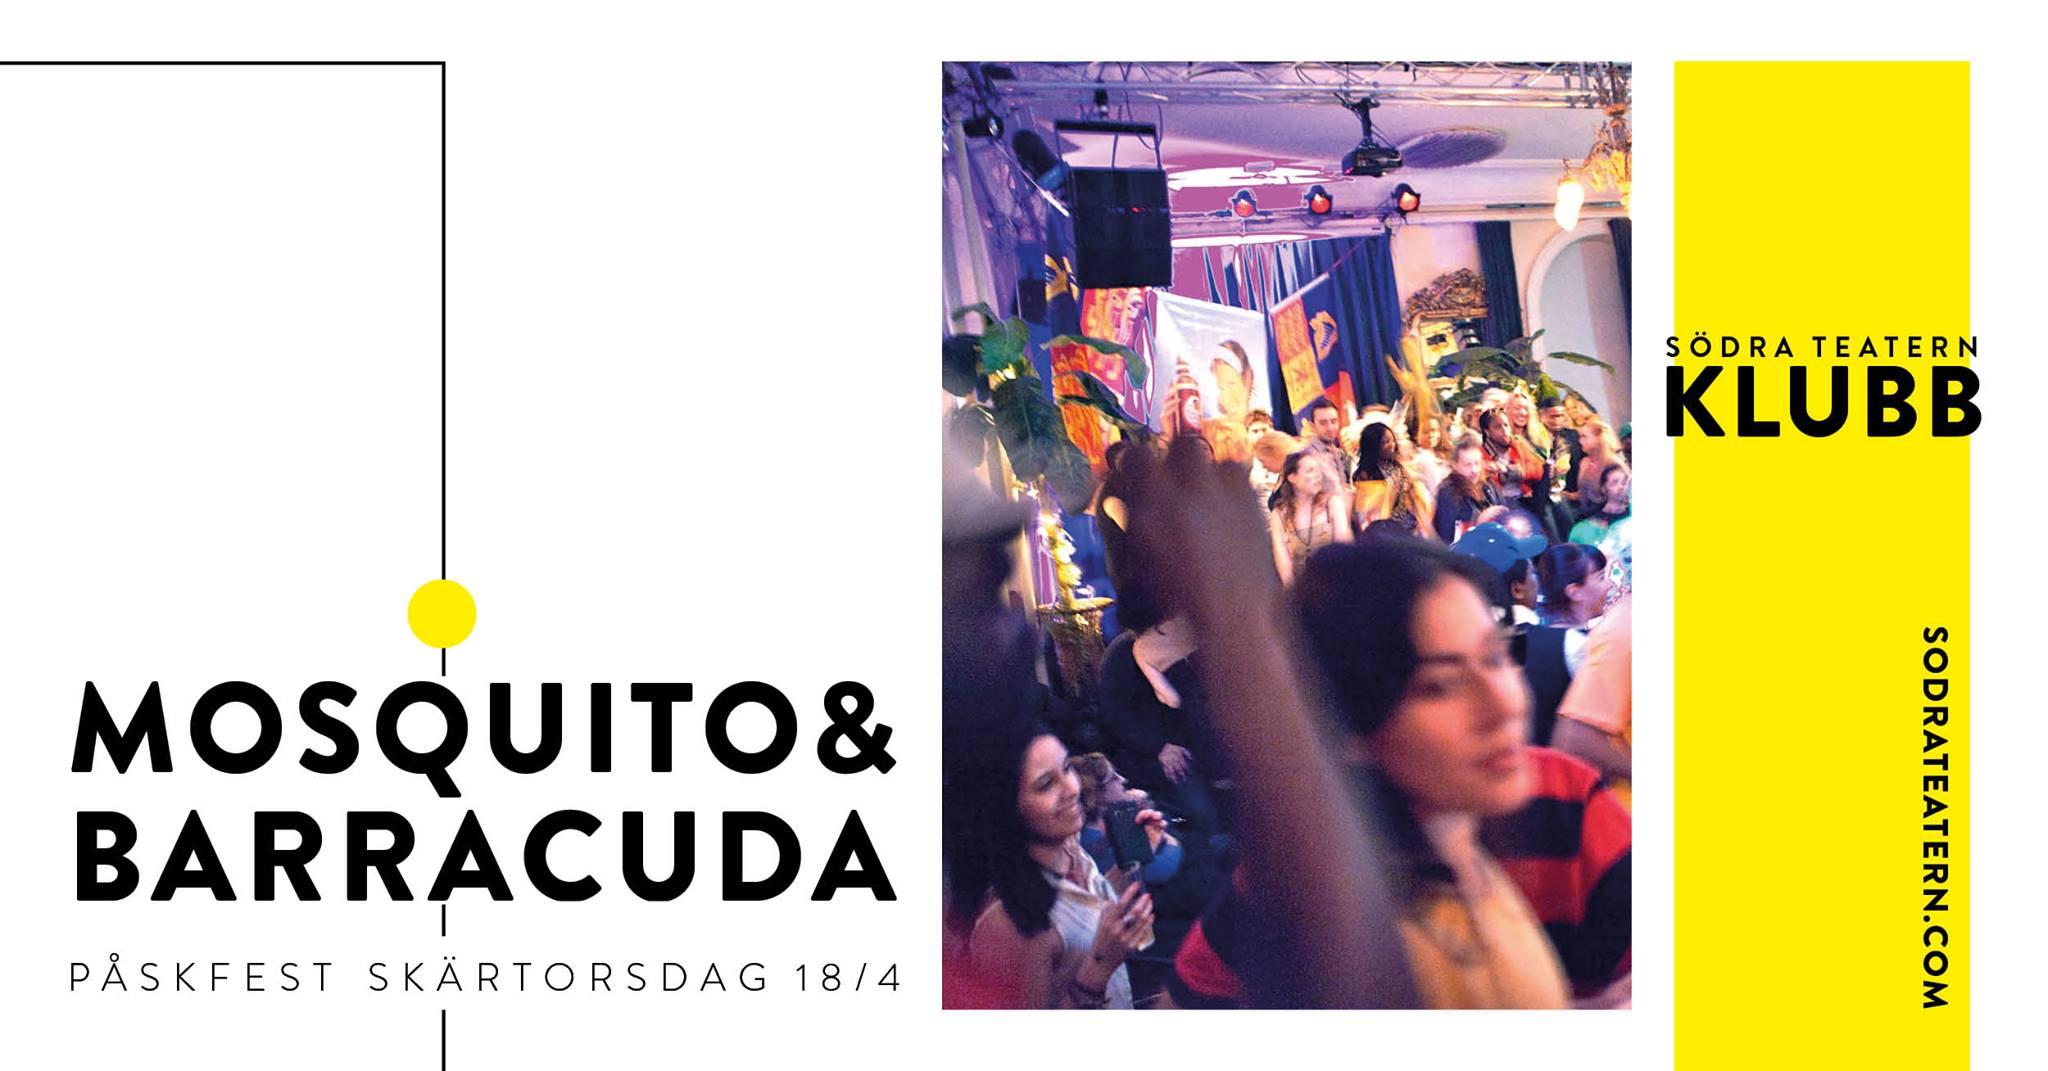 Klubb: Mosquito & Barracudas stora påskfest!